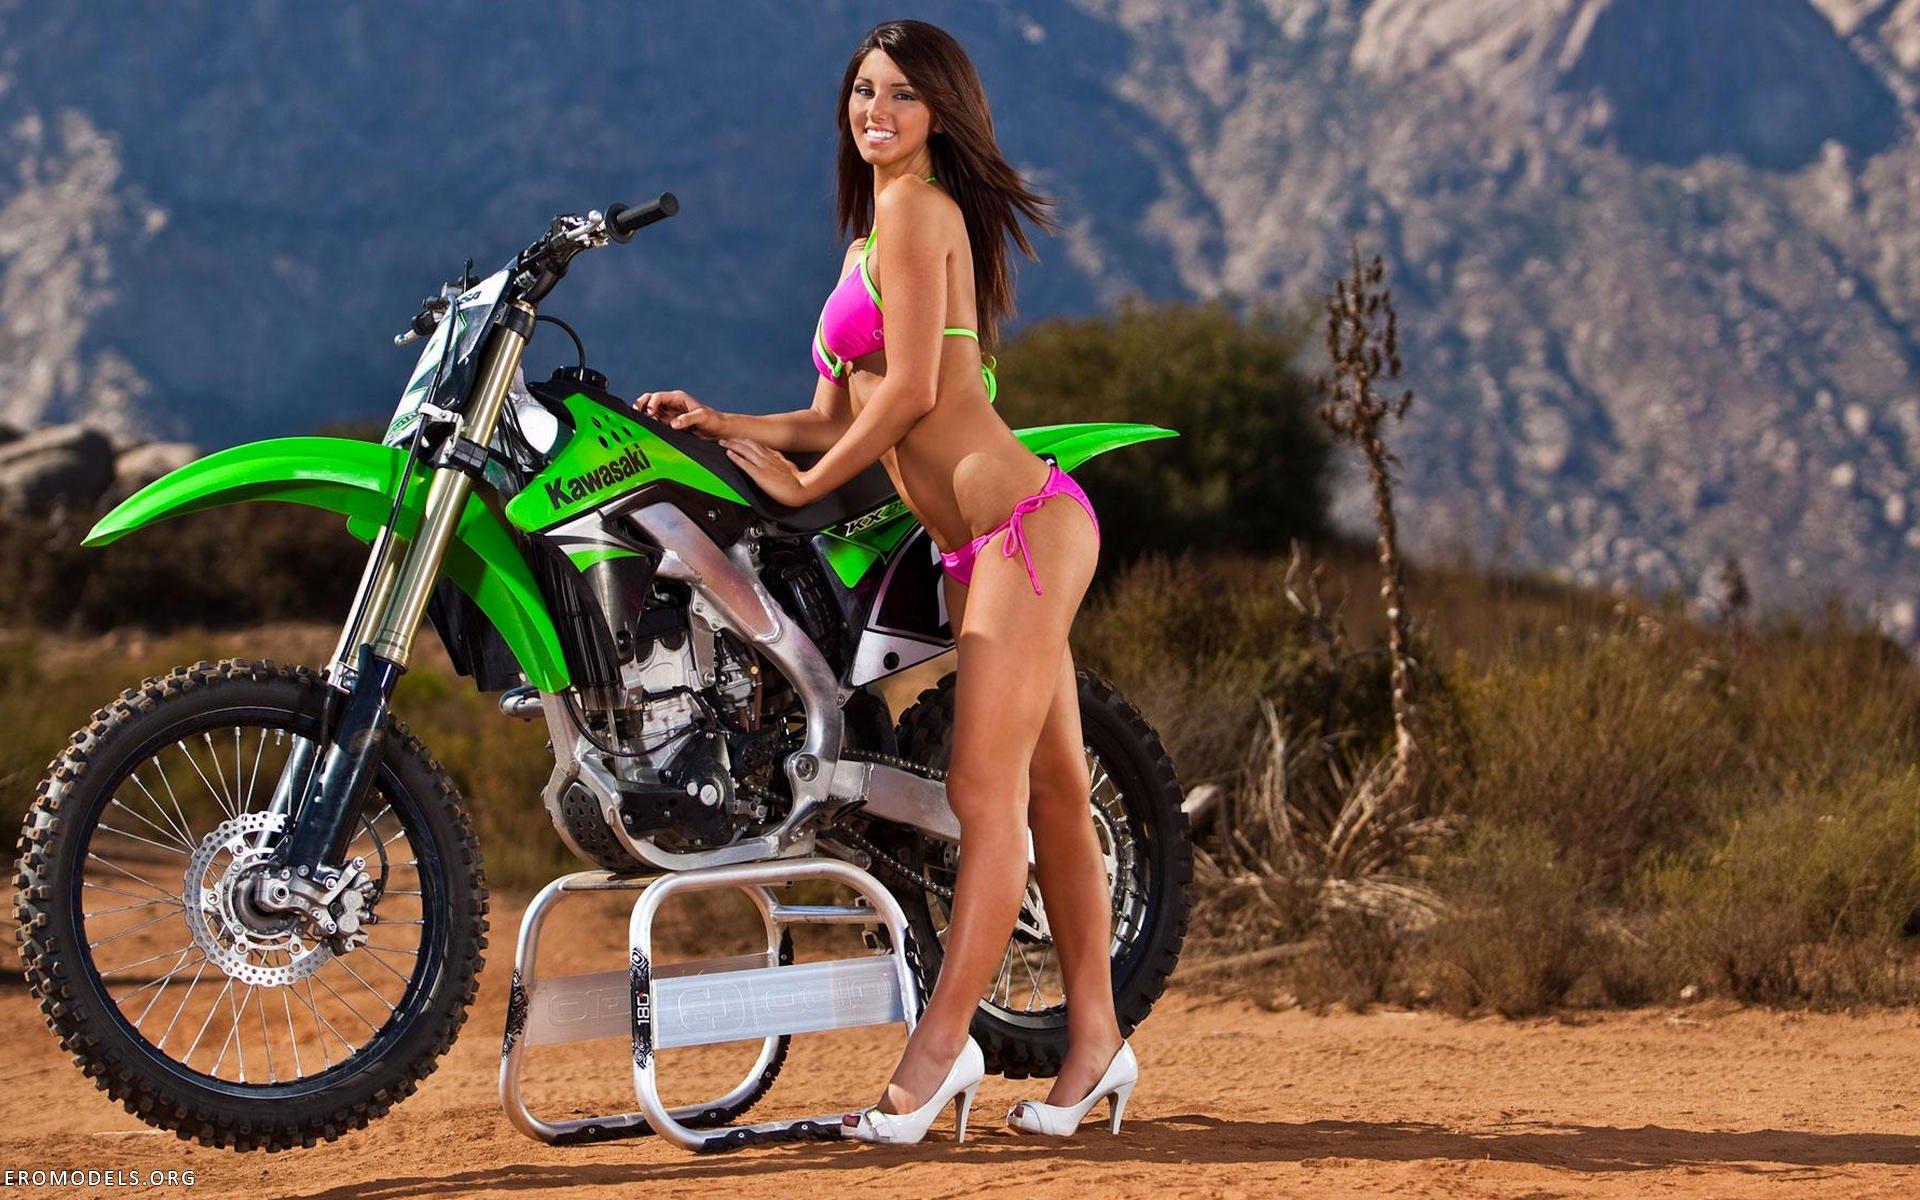 Motocross nude girls